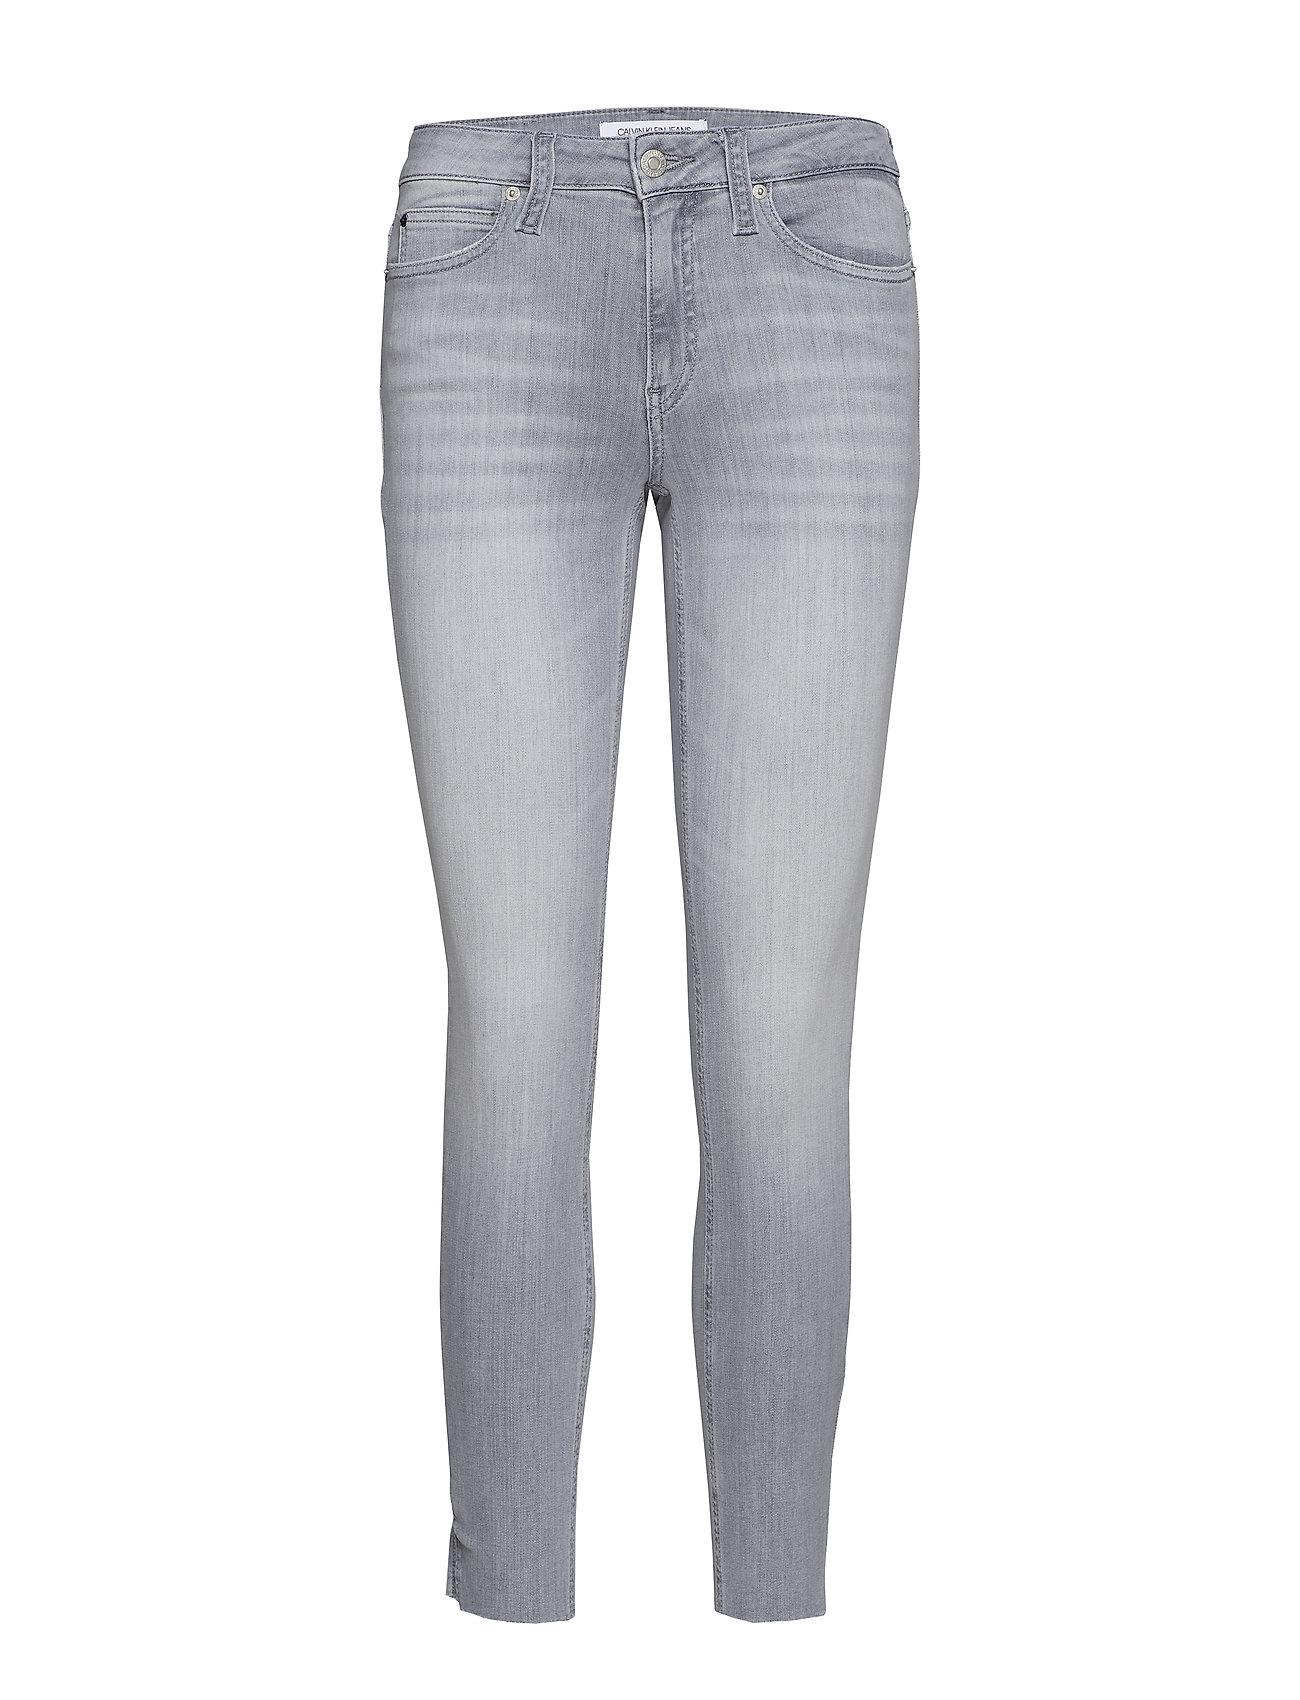 Calvin Klein Jeans CKJ 011 MID RISE SKI - JULIE GREY SPLIT HEM